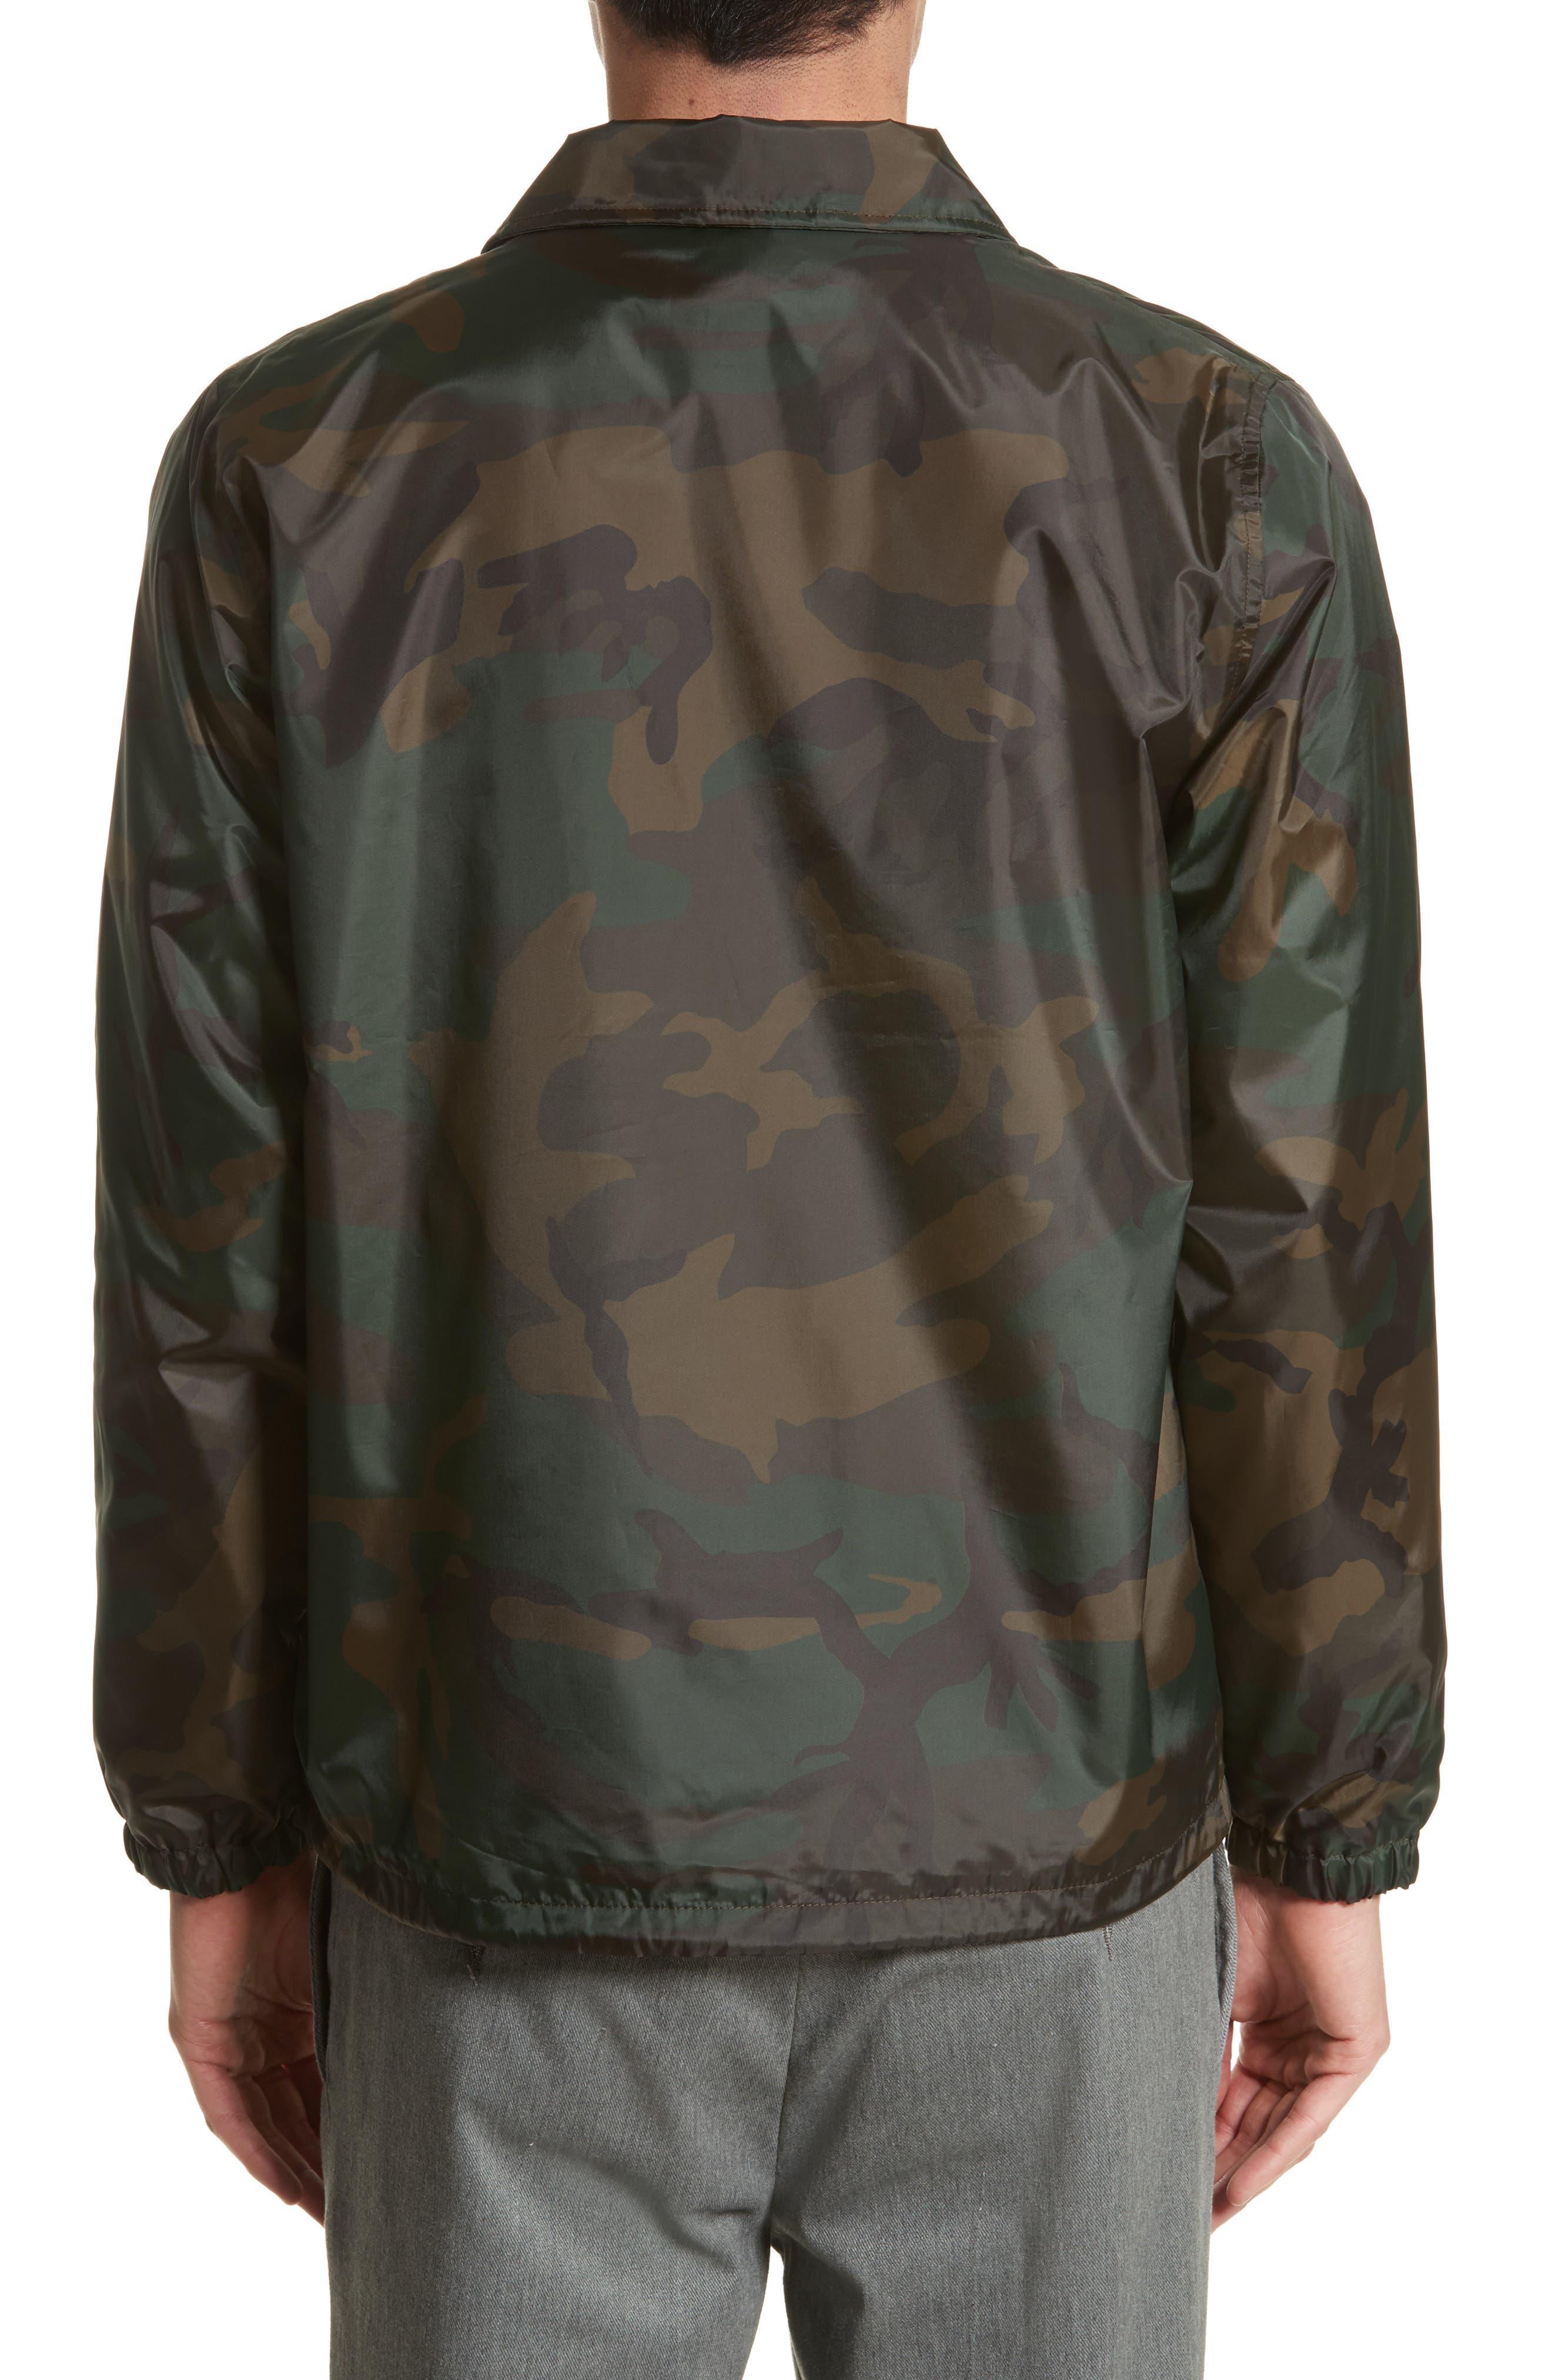 Camo Print Coach Jacket,                             Alternate thumbnail 2, color,                             Camo Combat Green/White